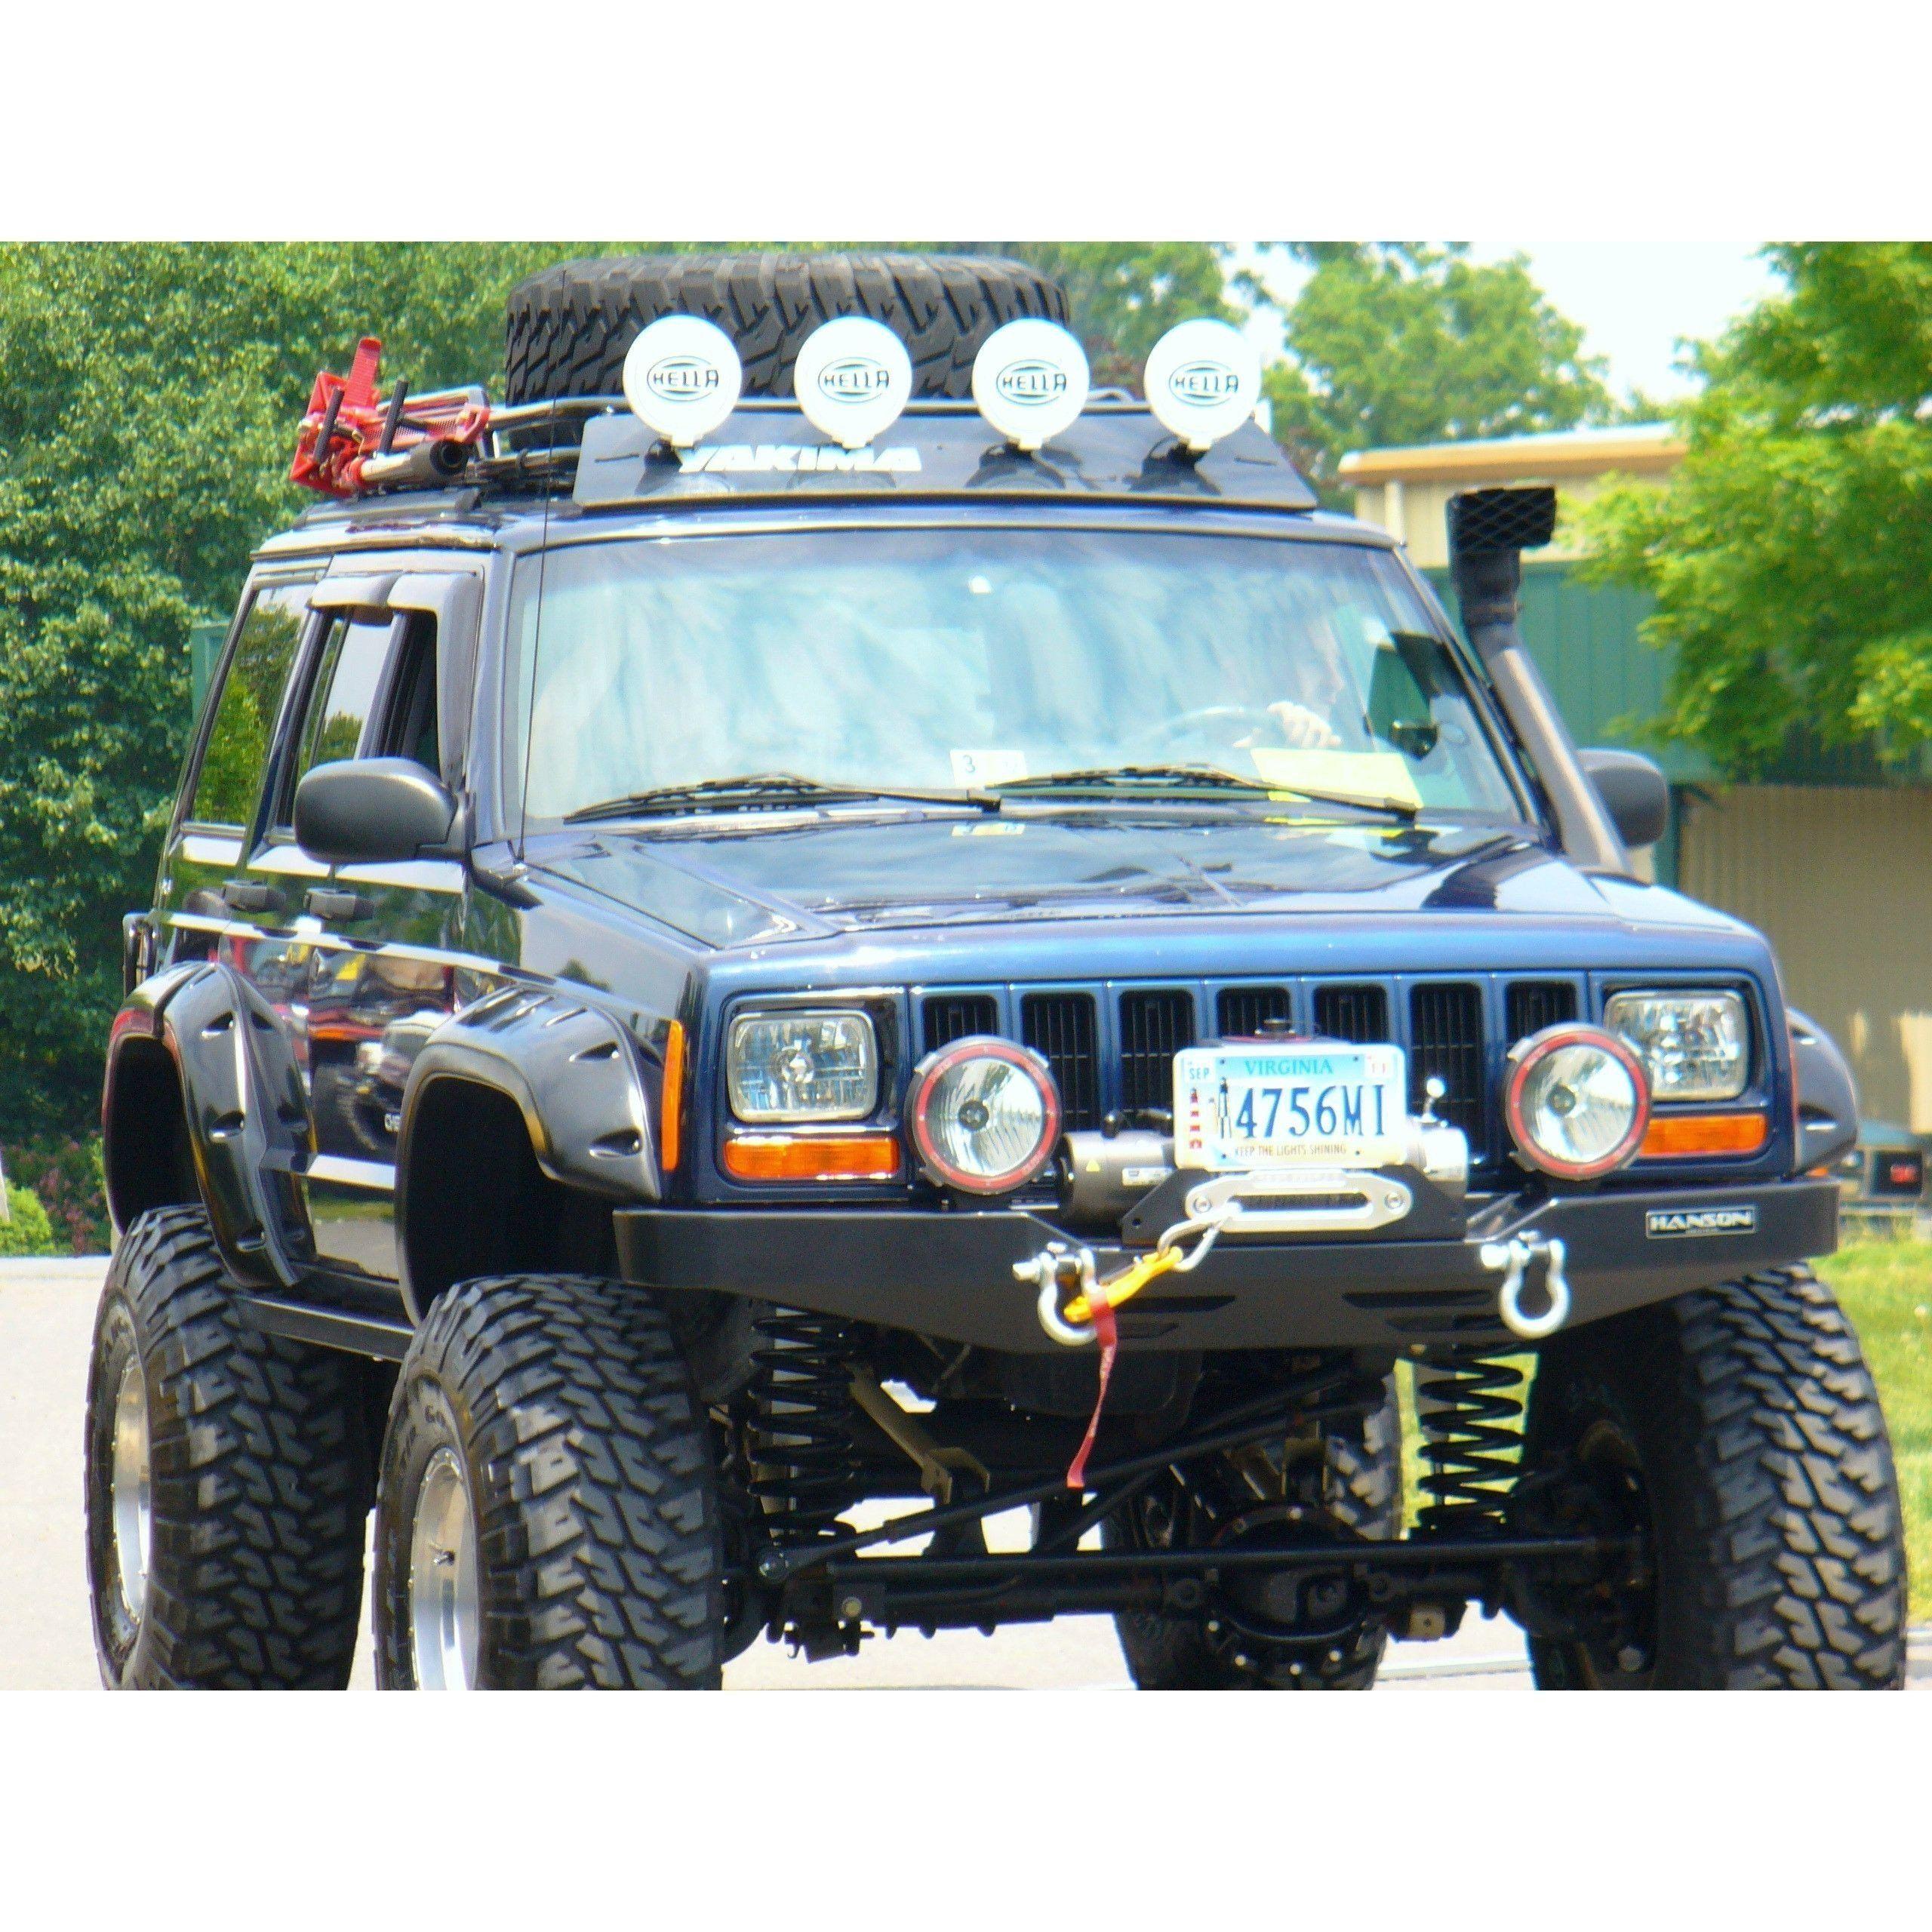 Jeep Cherokee Roof Rack Safari Style Xj Cherokee Jeep Cherokee